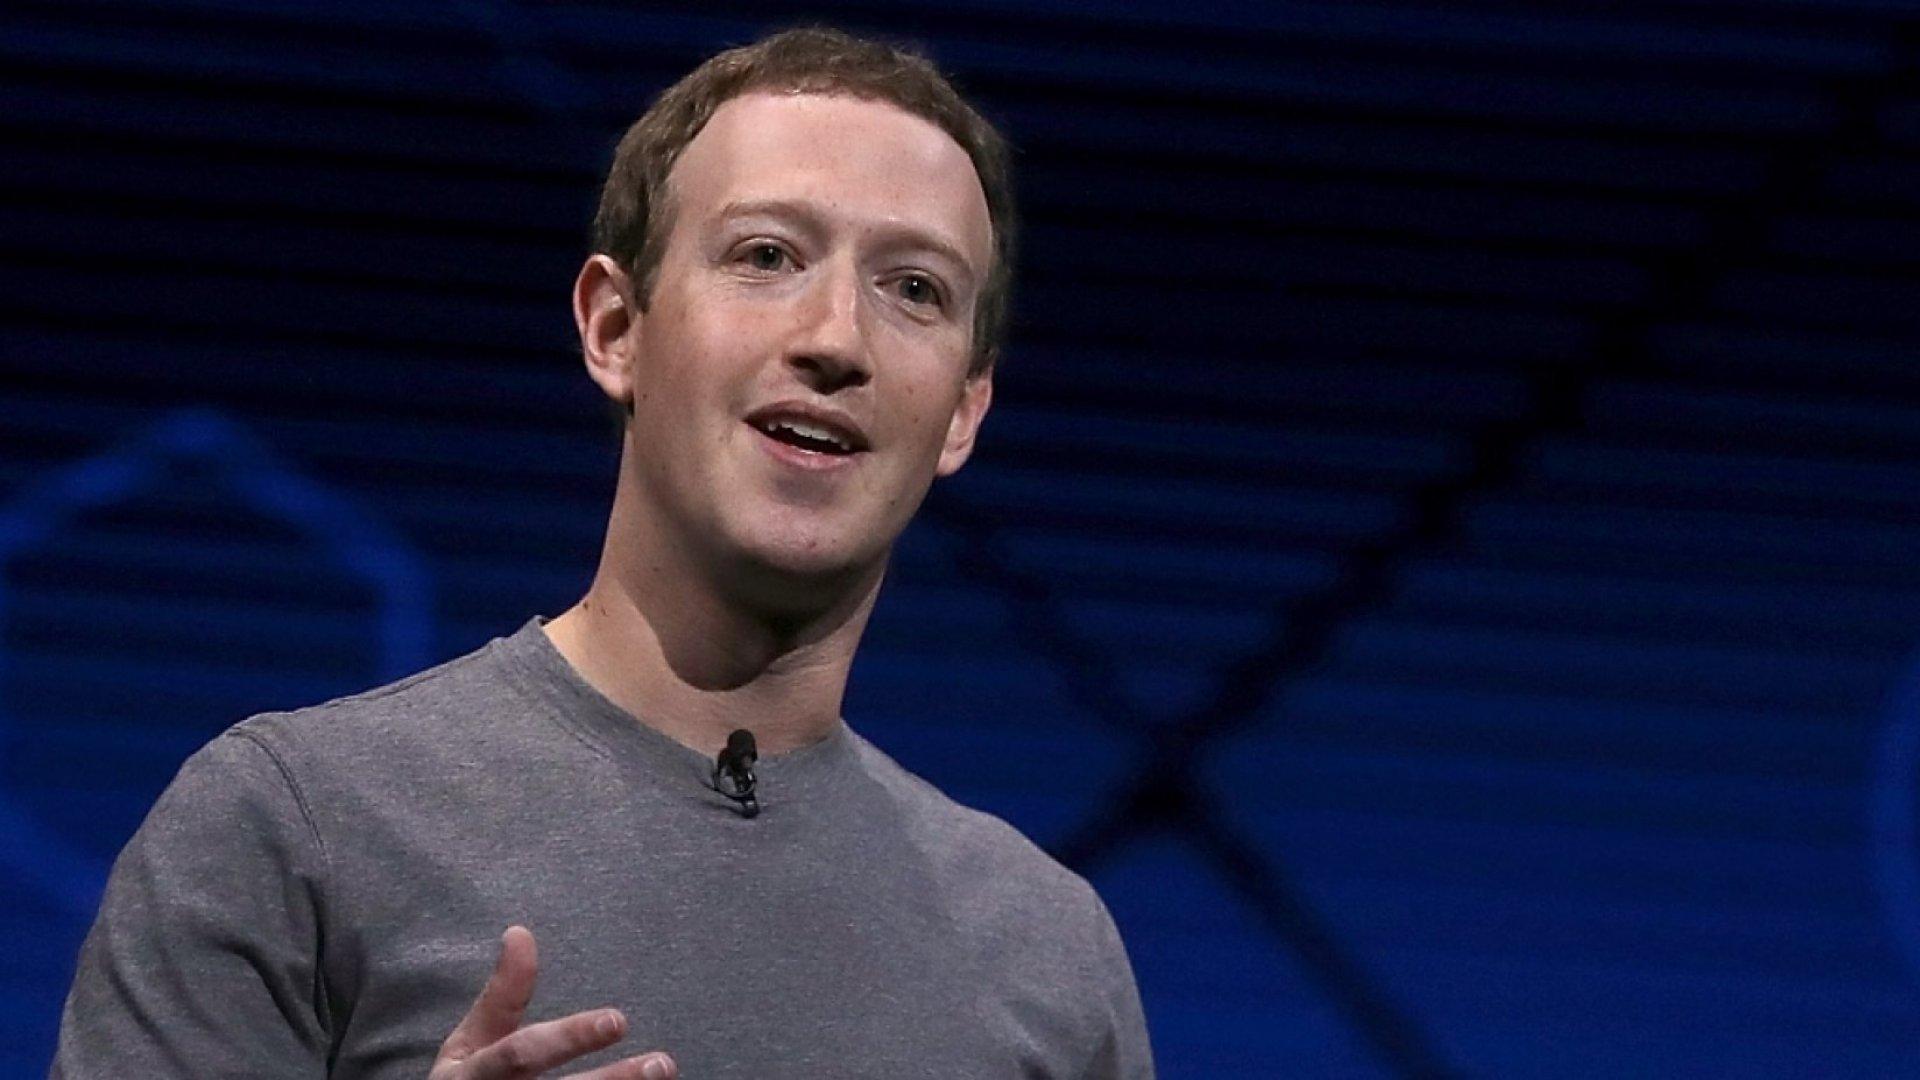 Mark Zuckerberg's Response to Donald Trump's Tweet Is a Master Class in Handling Criticism